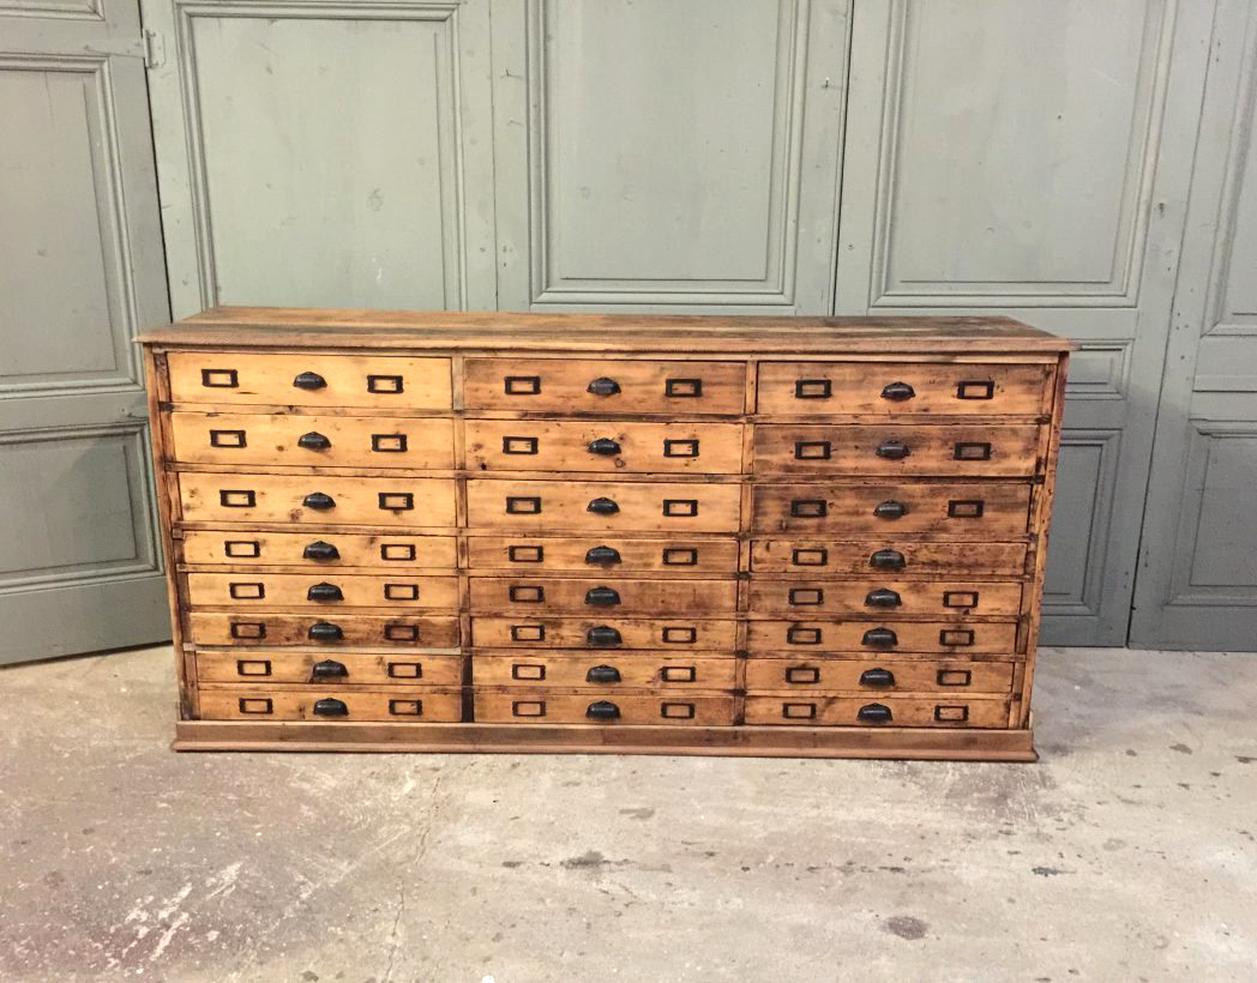 occasion tout bon coin meubles anciens